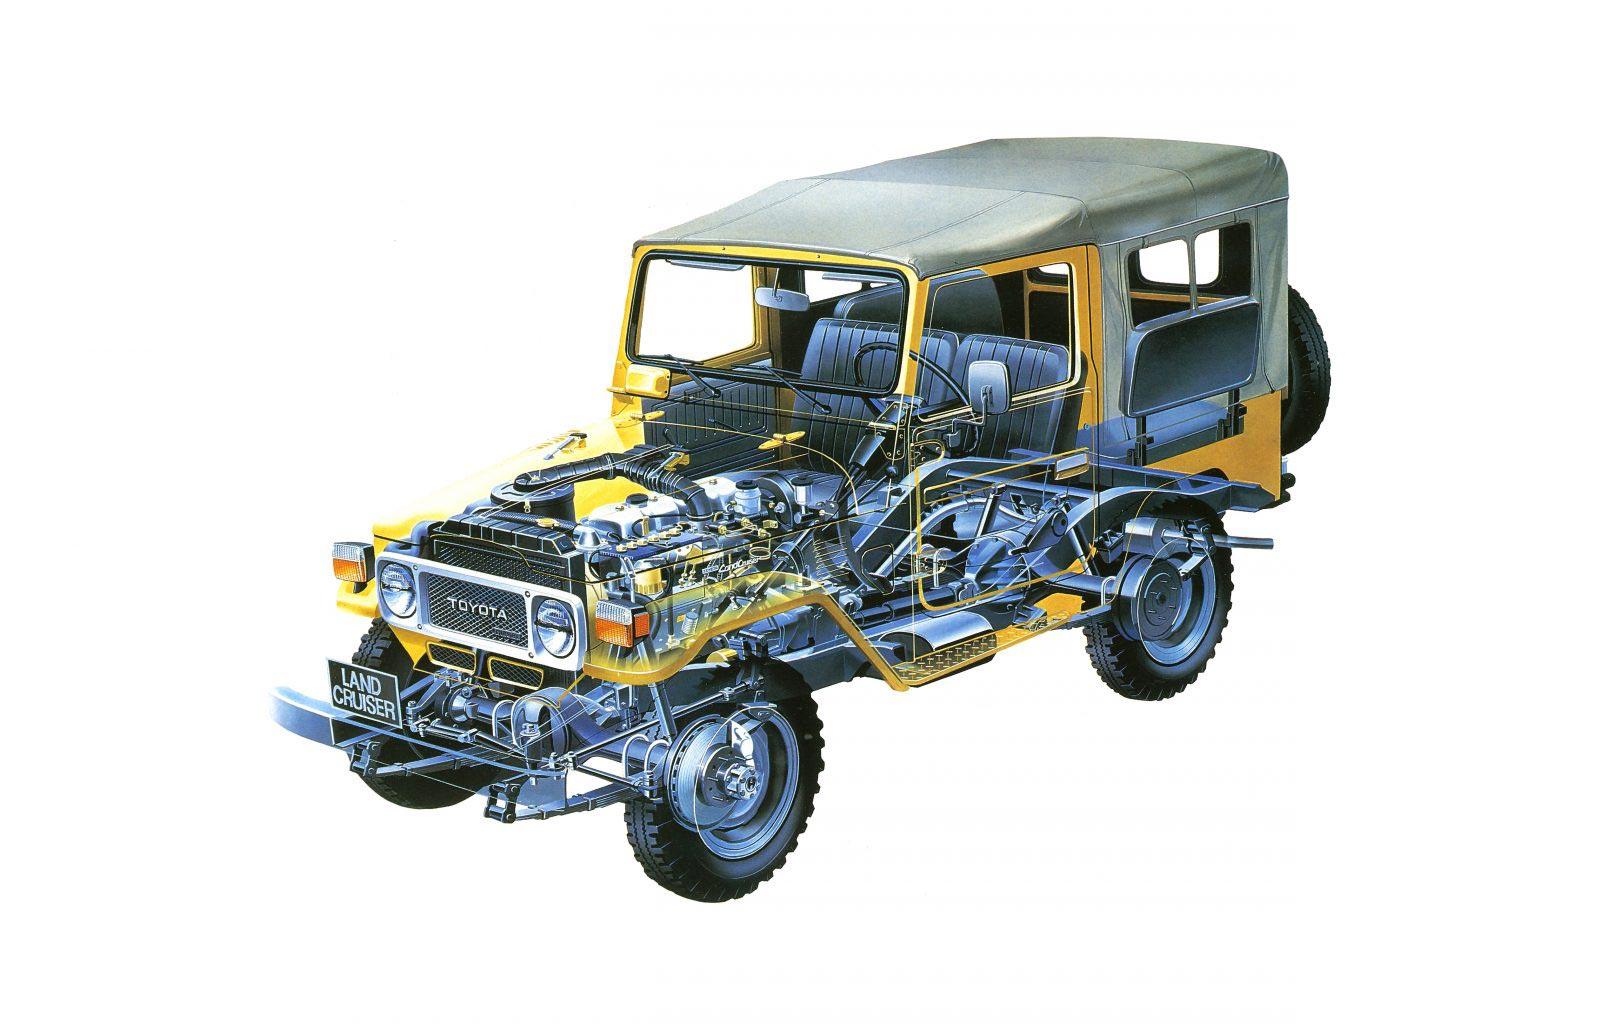 Toyota Land Cruiser J40 cutaway